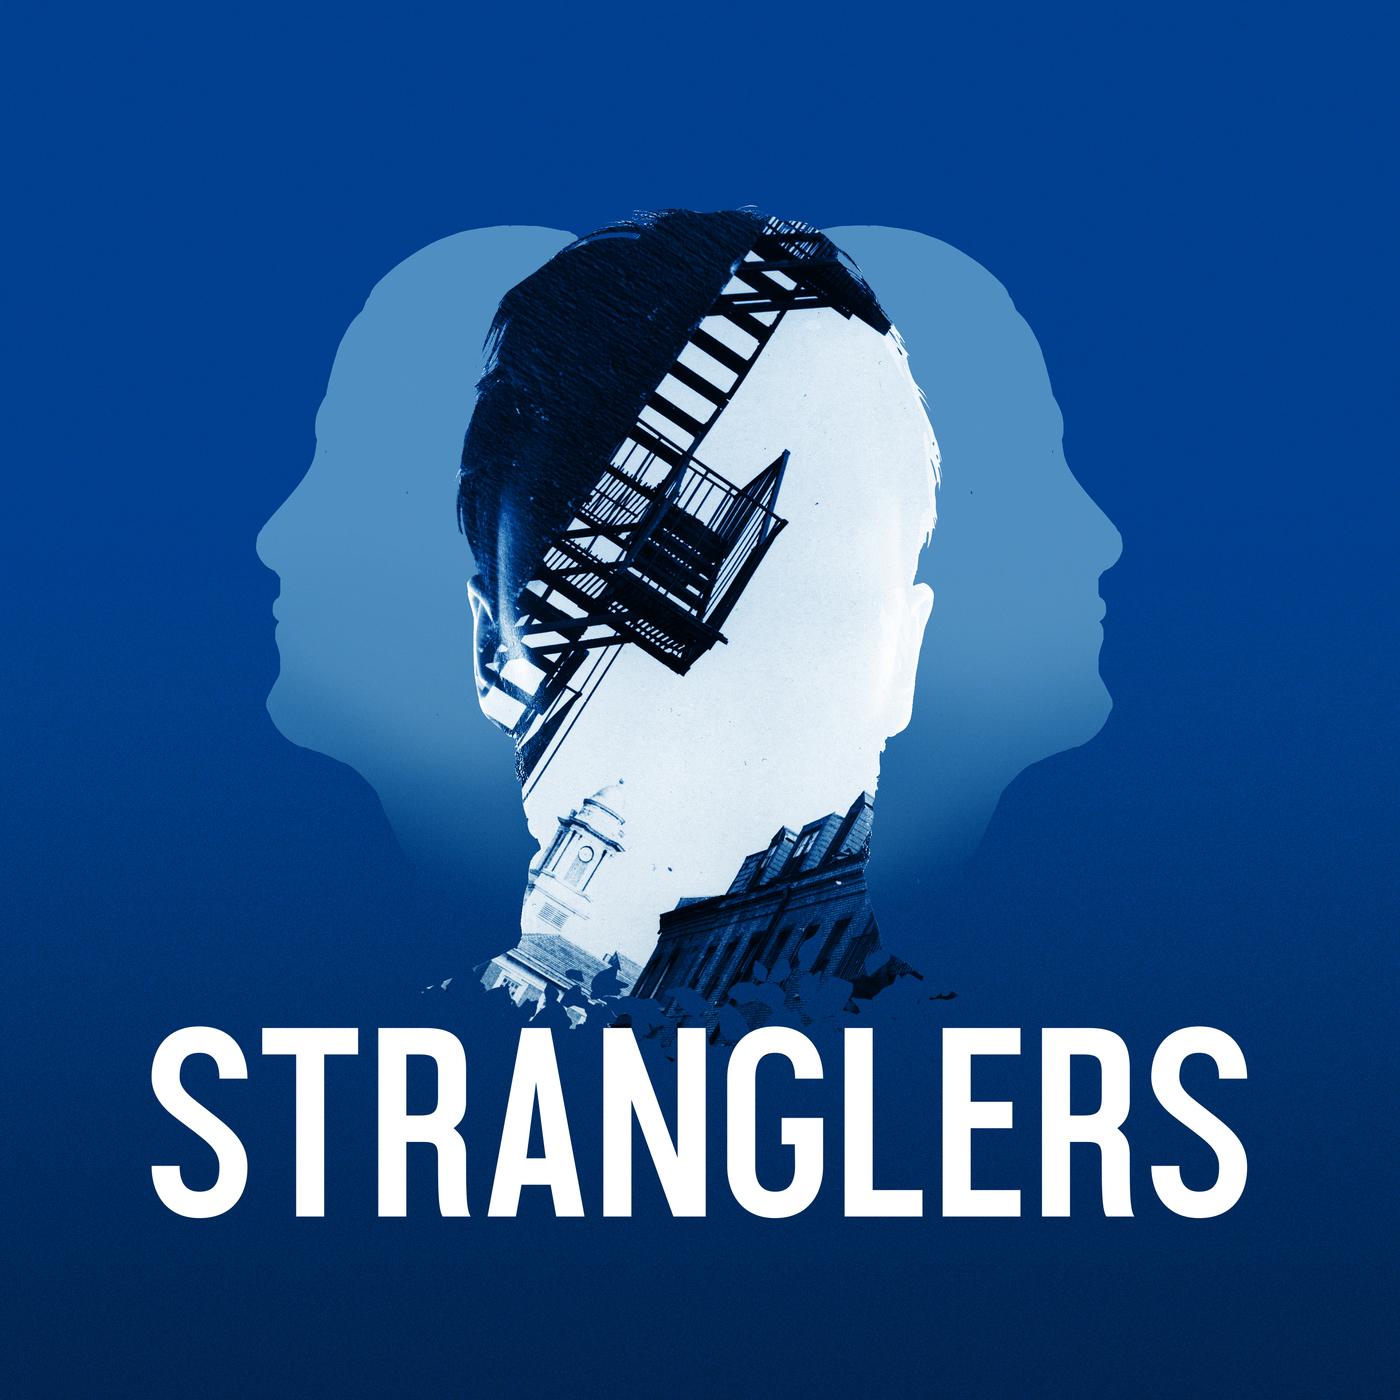 HEADLONG: Missing Richard Simmons Returns